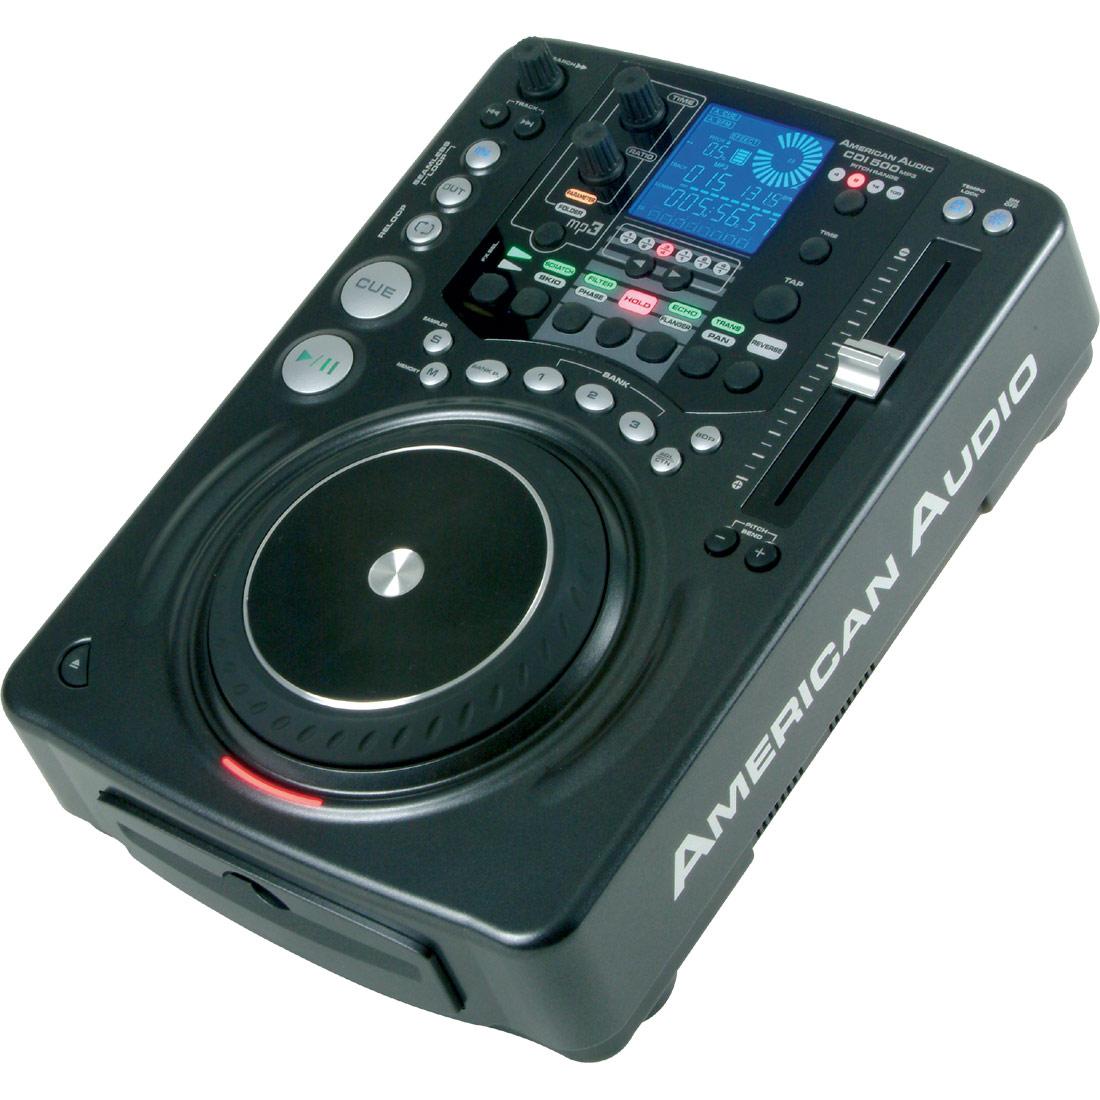 CDI 500 MP3